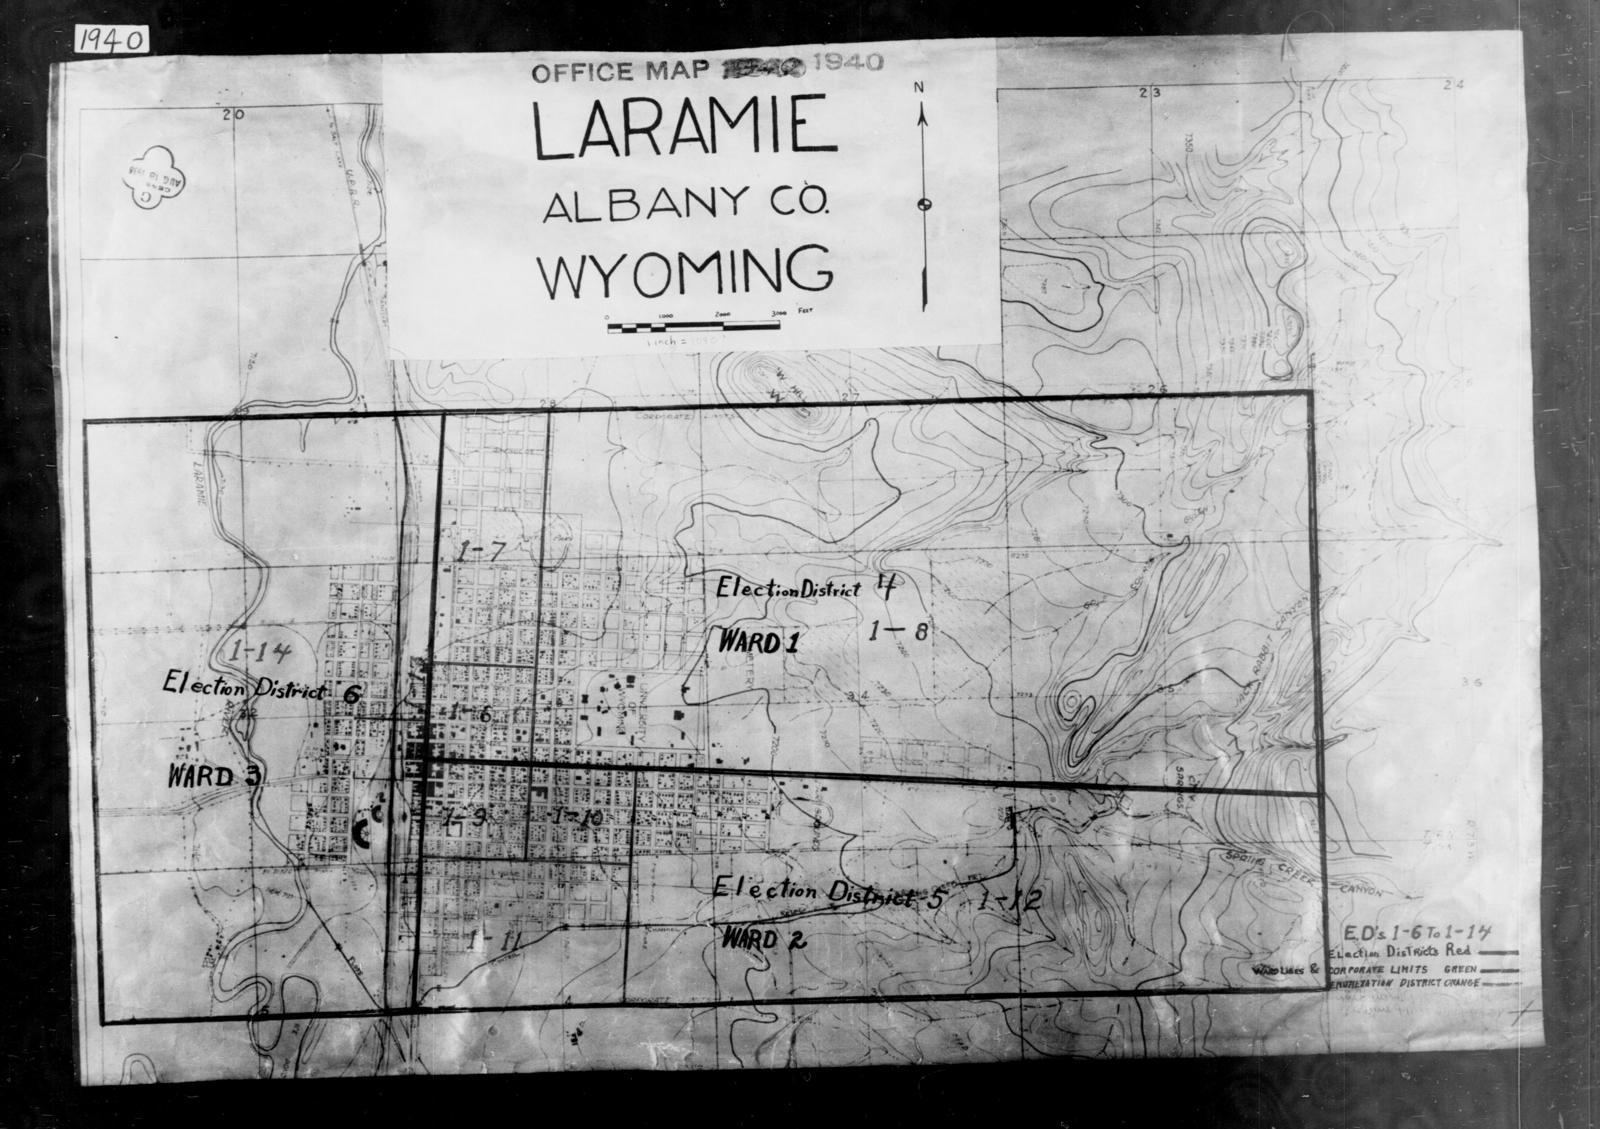 1940 Census Enumeration District Maps - Wyoming - Albany ... on laramie wyoming elevation map, laramie mountains wyoming, casper wyoming map, laramie county wyoming road map, city of laramie wyoming map, fort laramie wyoming map,